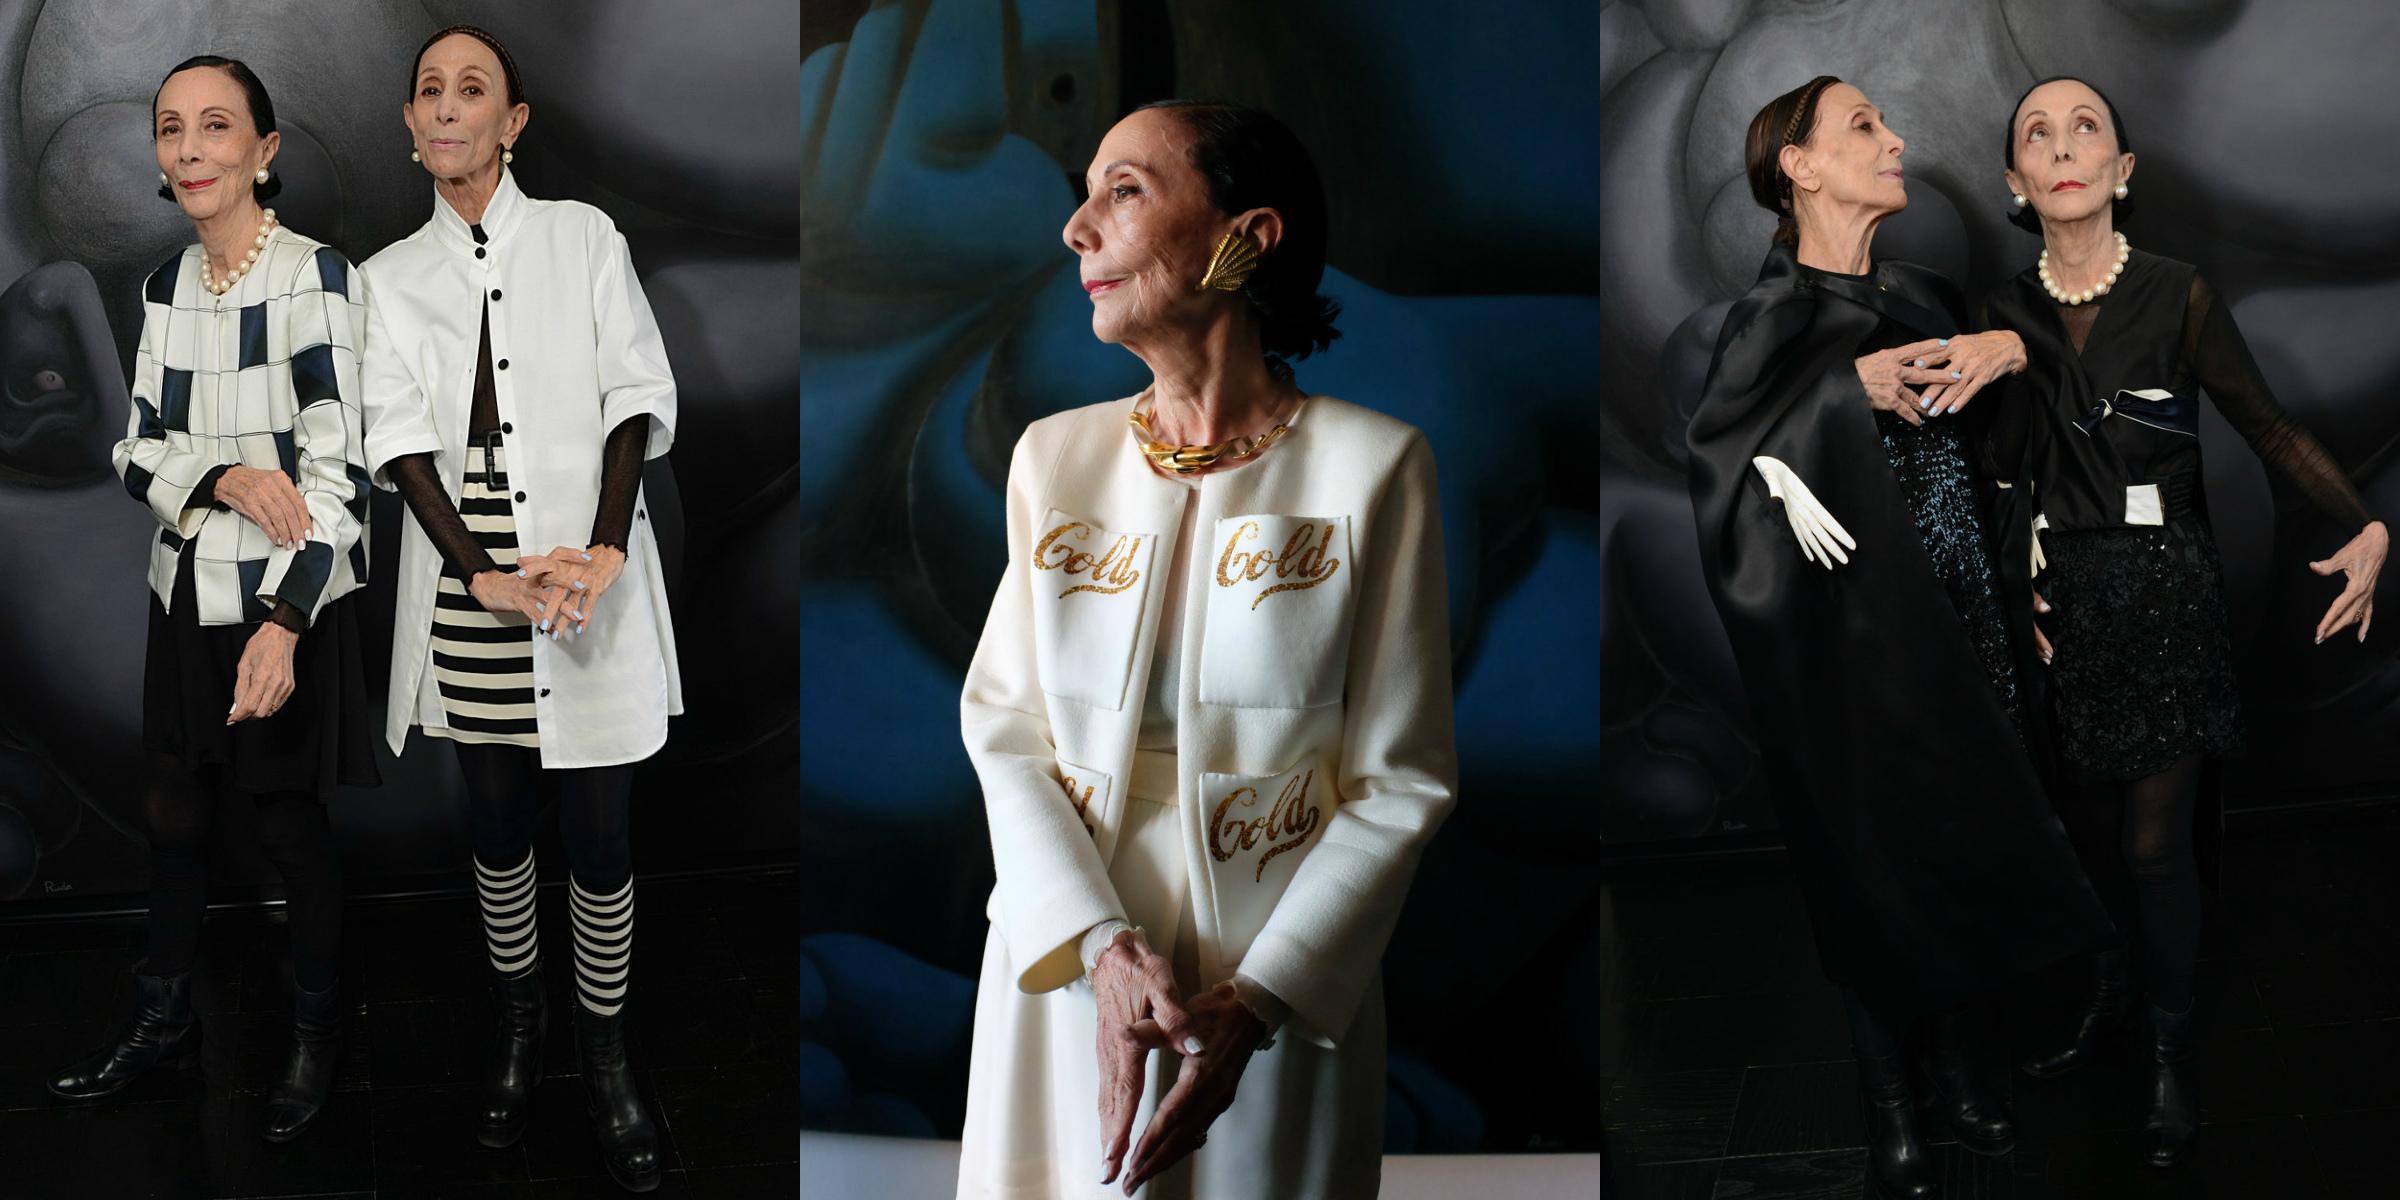 Ü60 Bloggerin Ursel vom Iknmlo Fashionblog über Fanny Karsts junge Mode für alte Damen